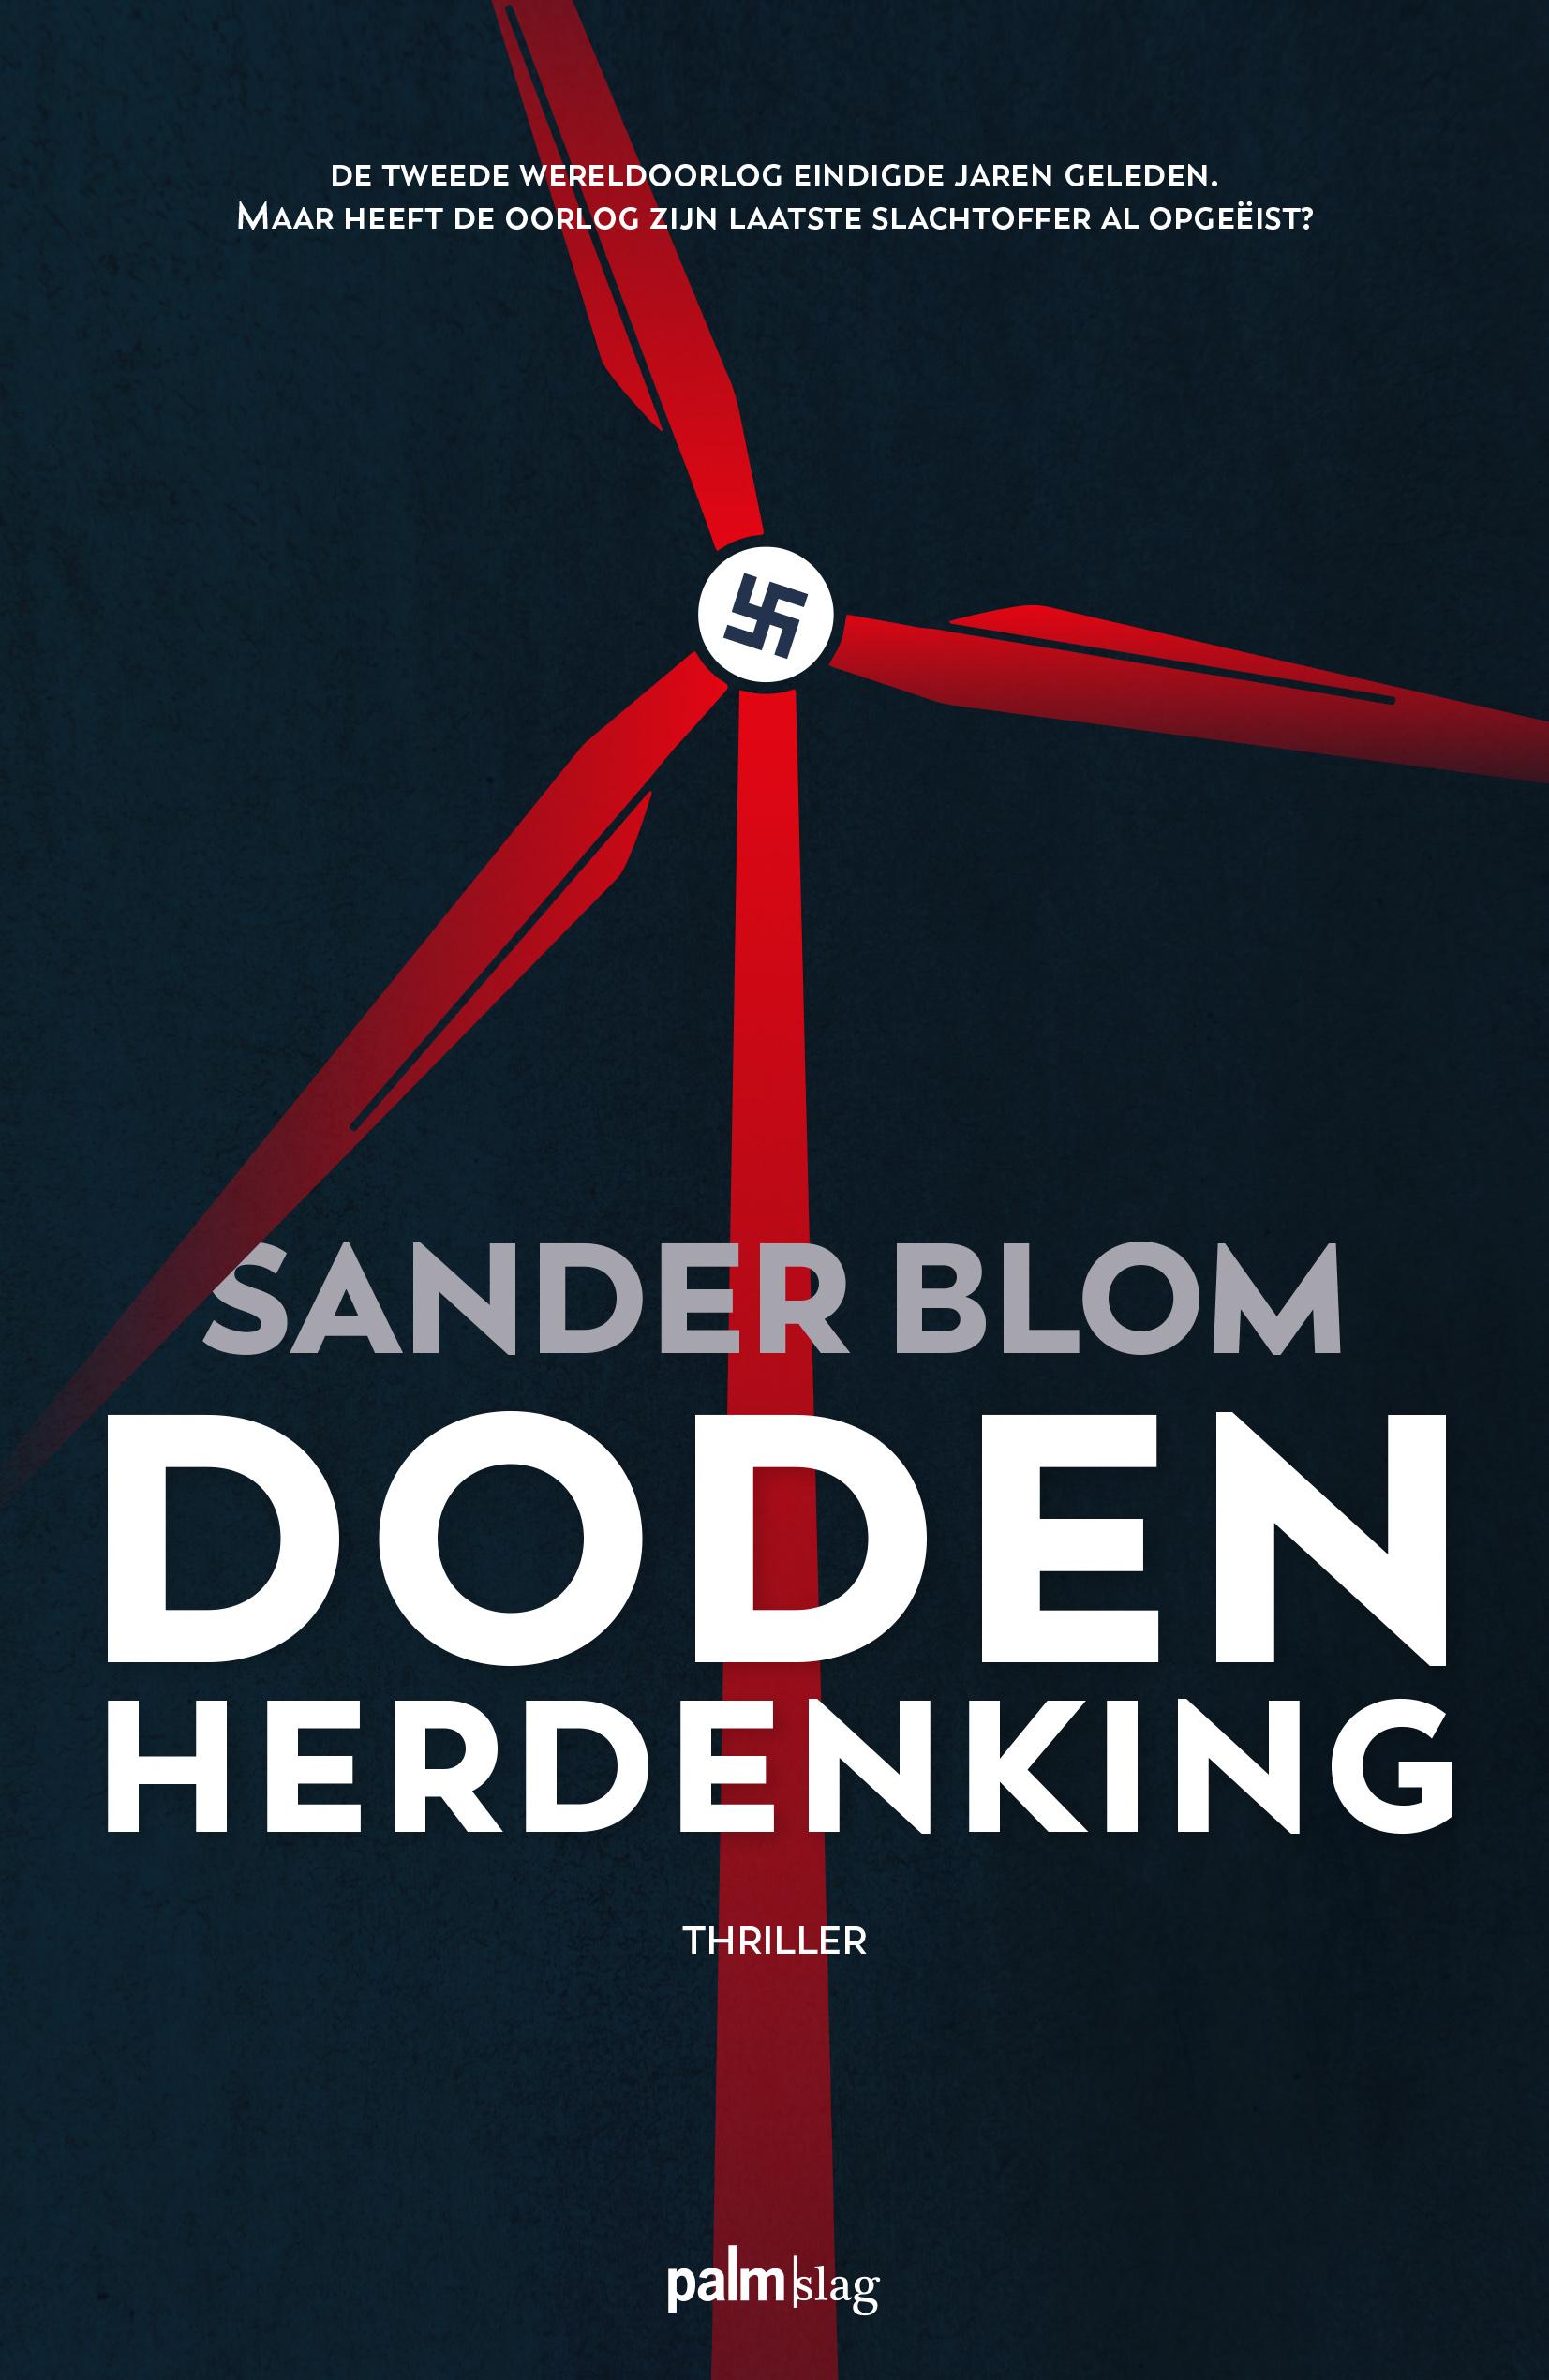 Dodenherdenking thriller Sander Blom